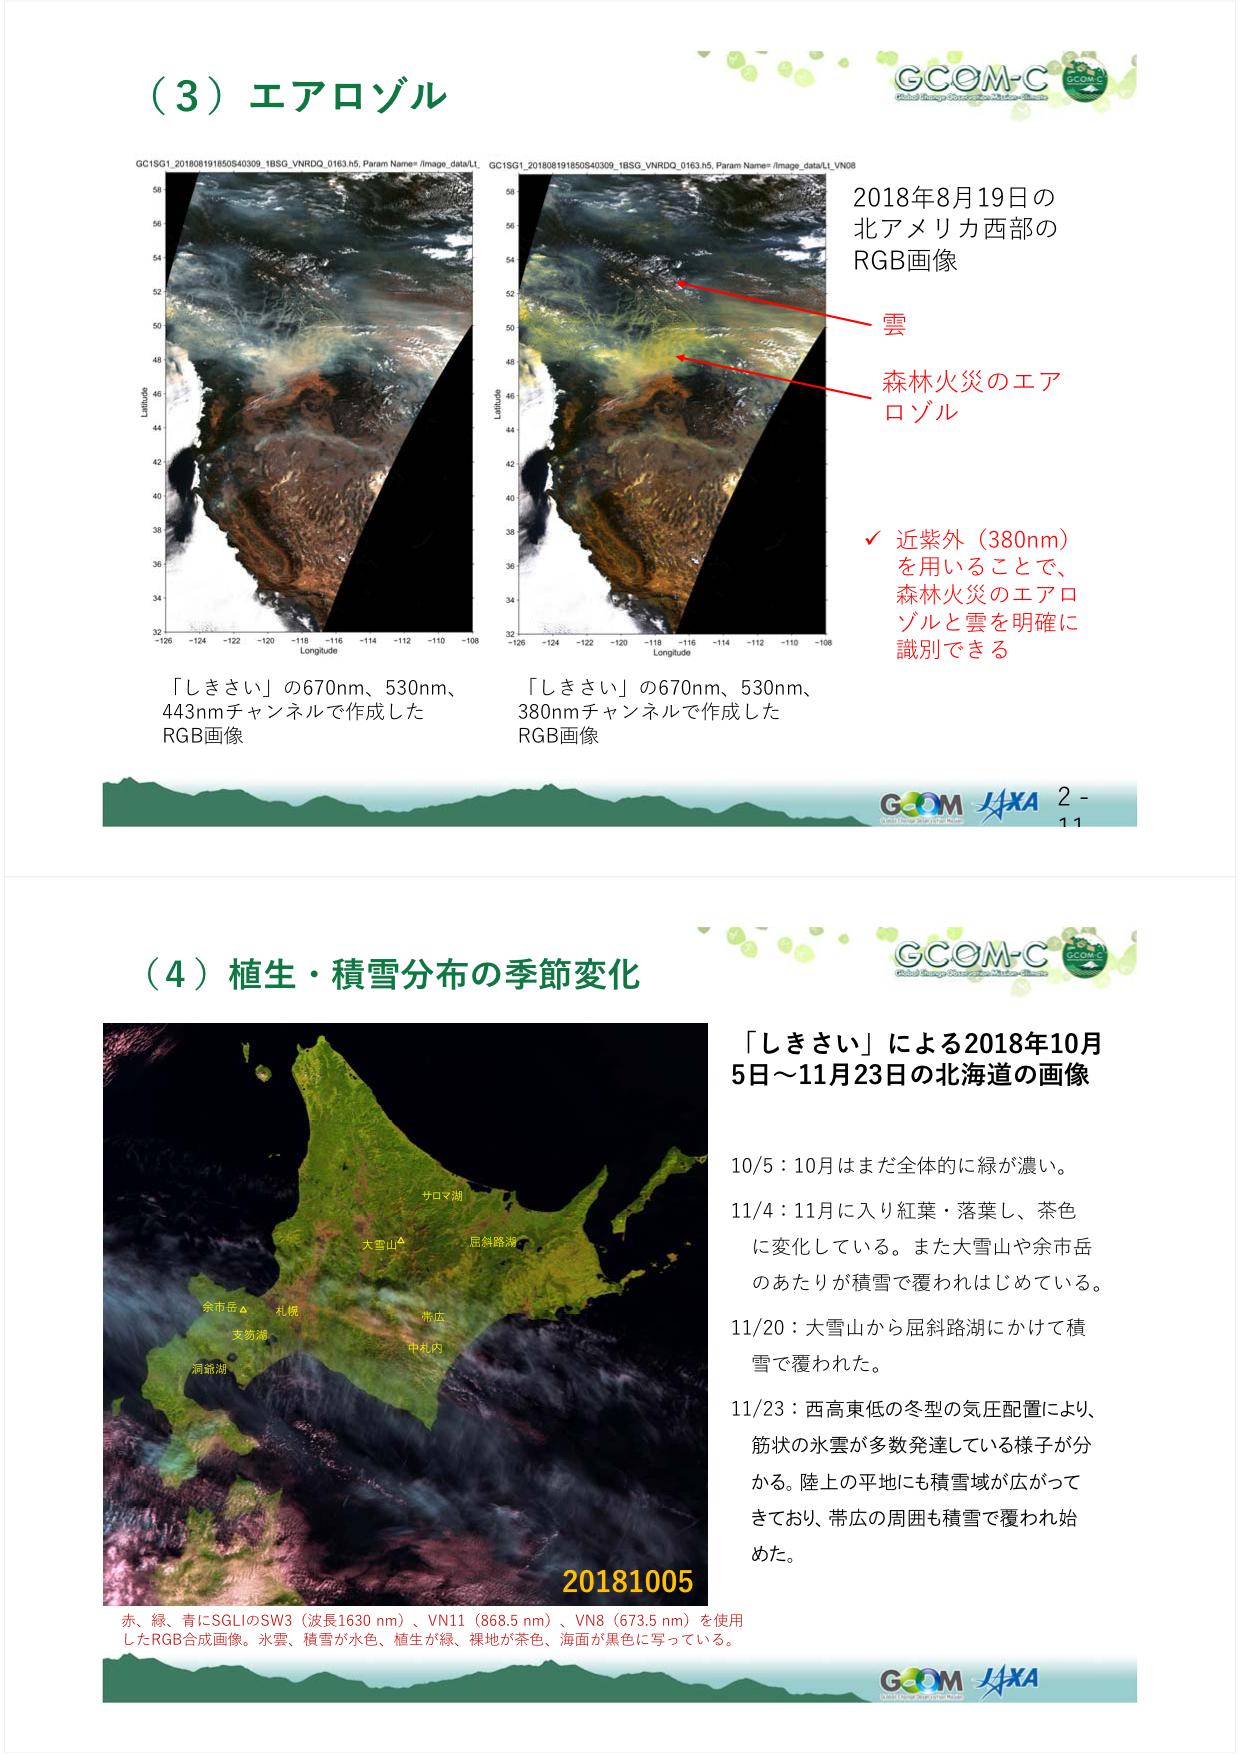 f:id:Imamura:20181220152515p:plain